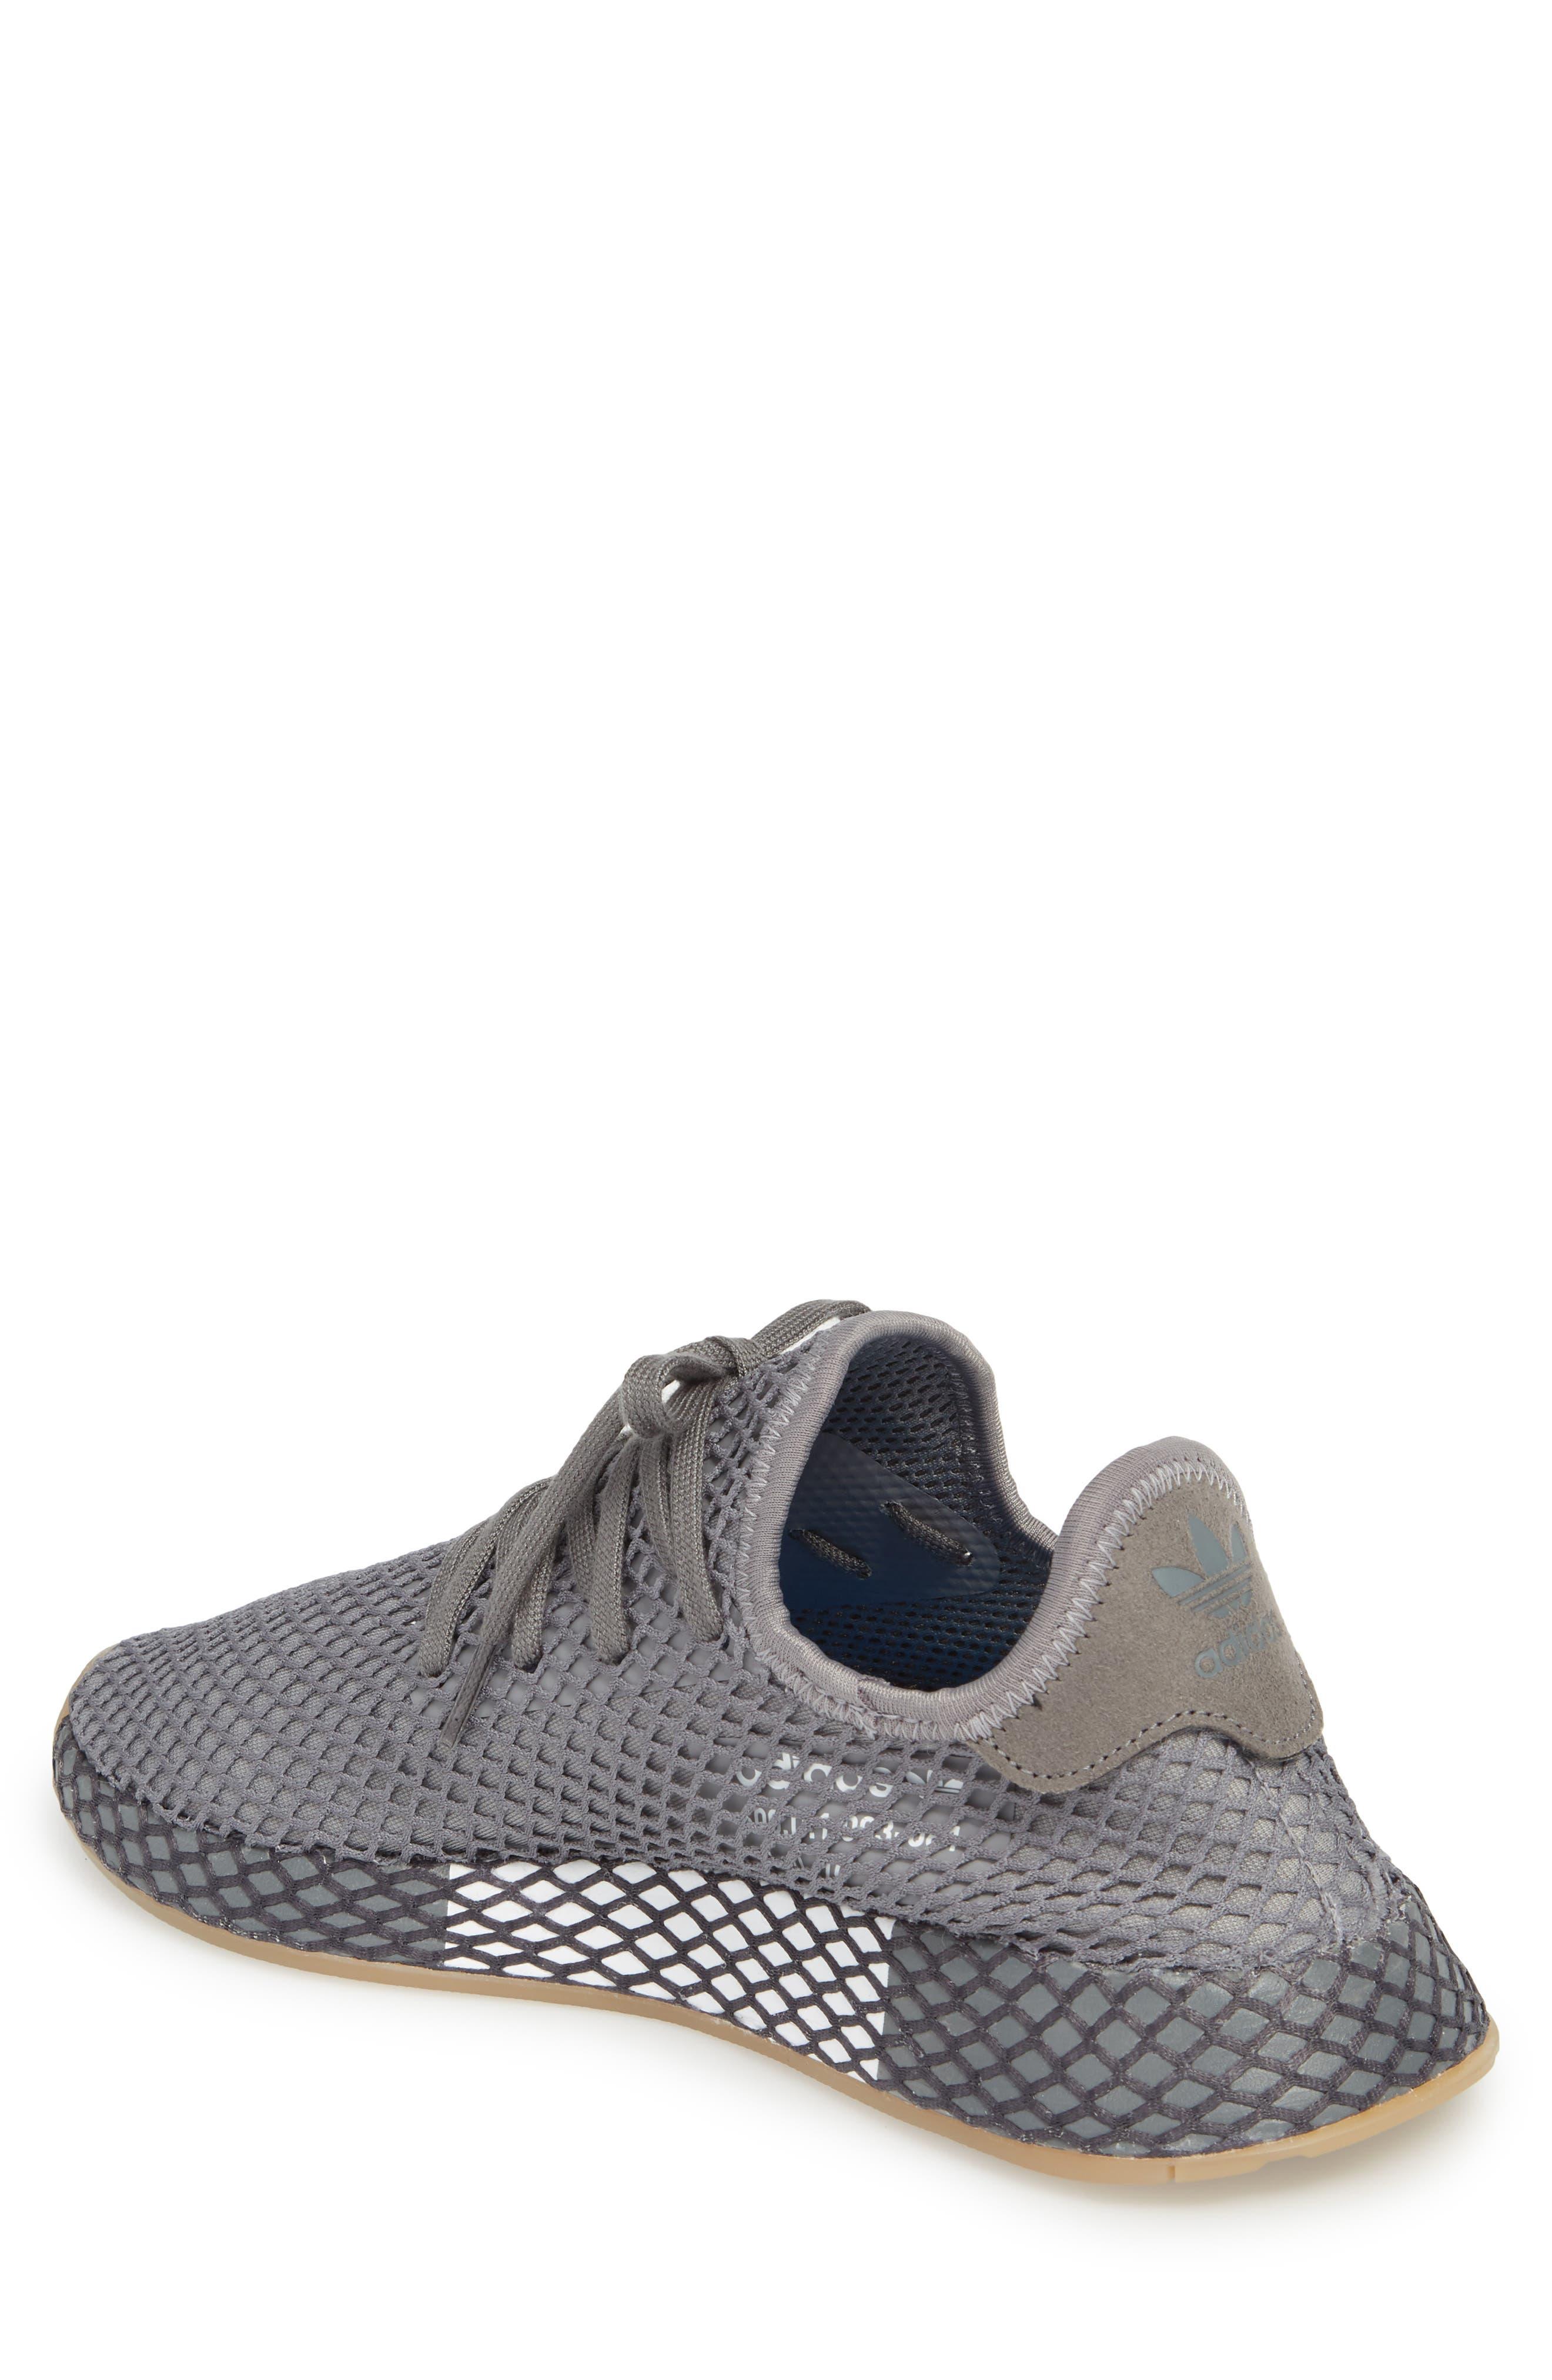 Deerupt Runner Sneaker,                             Alternate thumbnail 19, color,